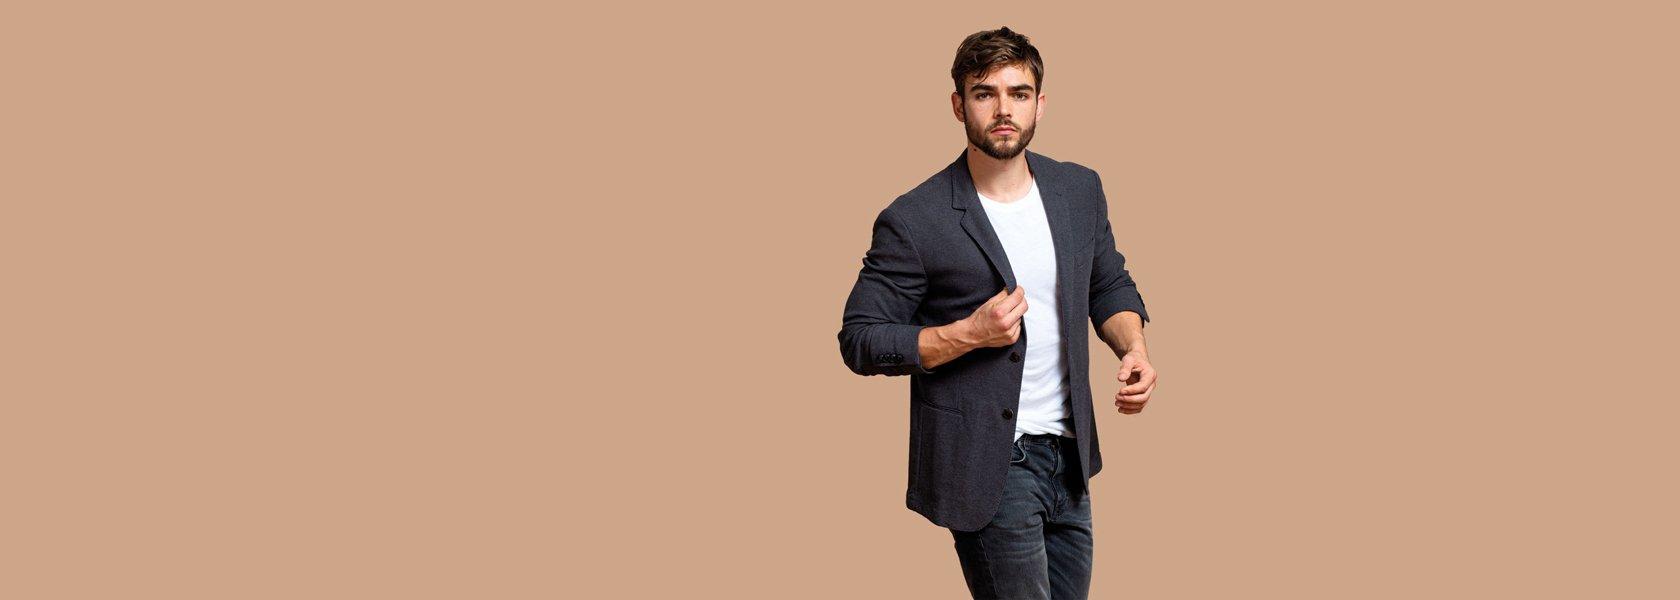 Mann trägt faire Mode